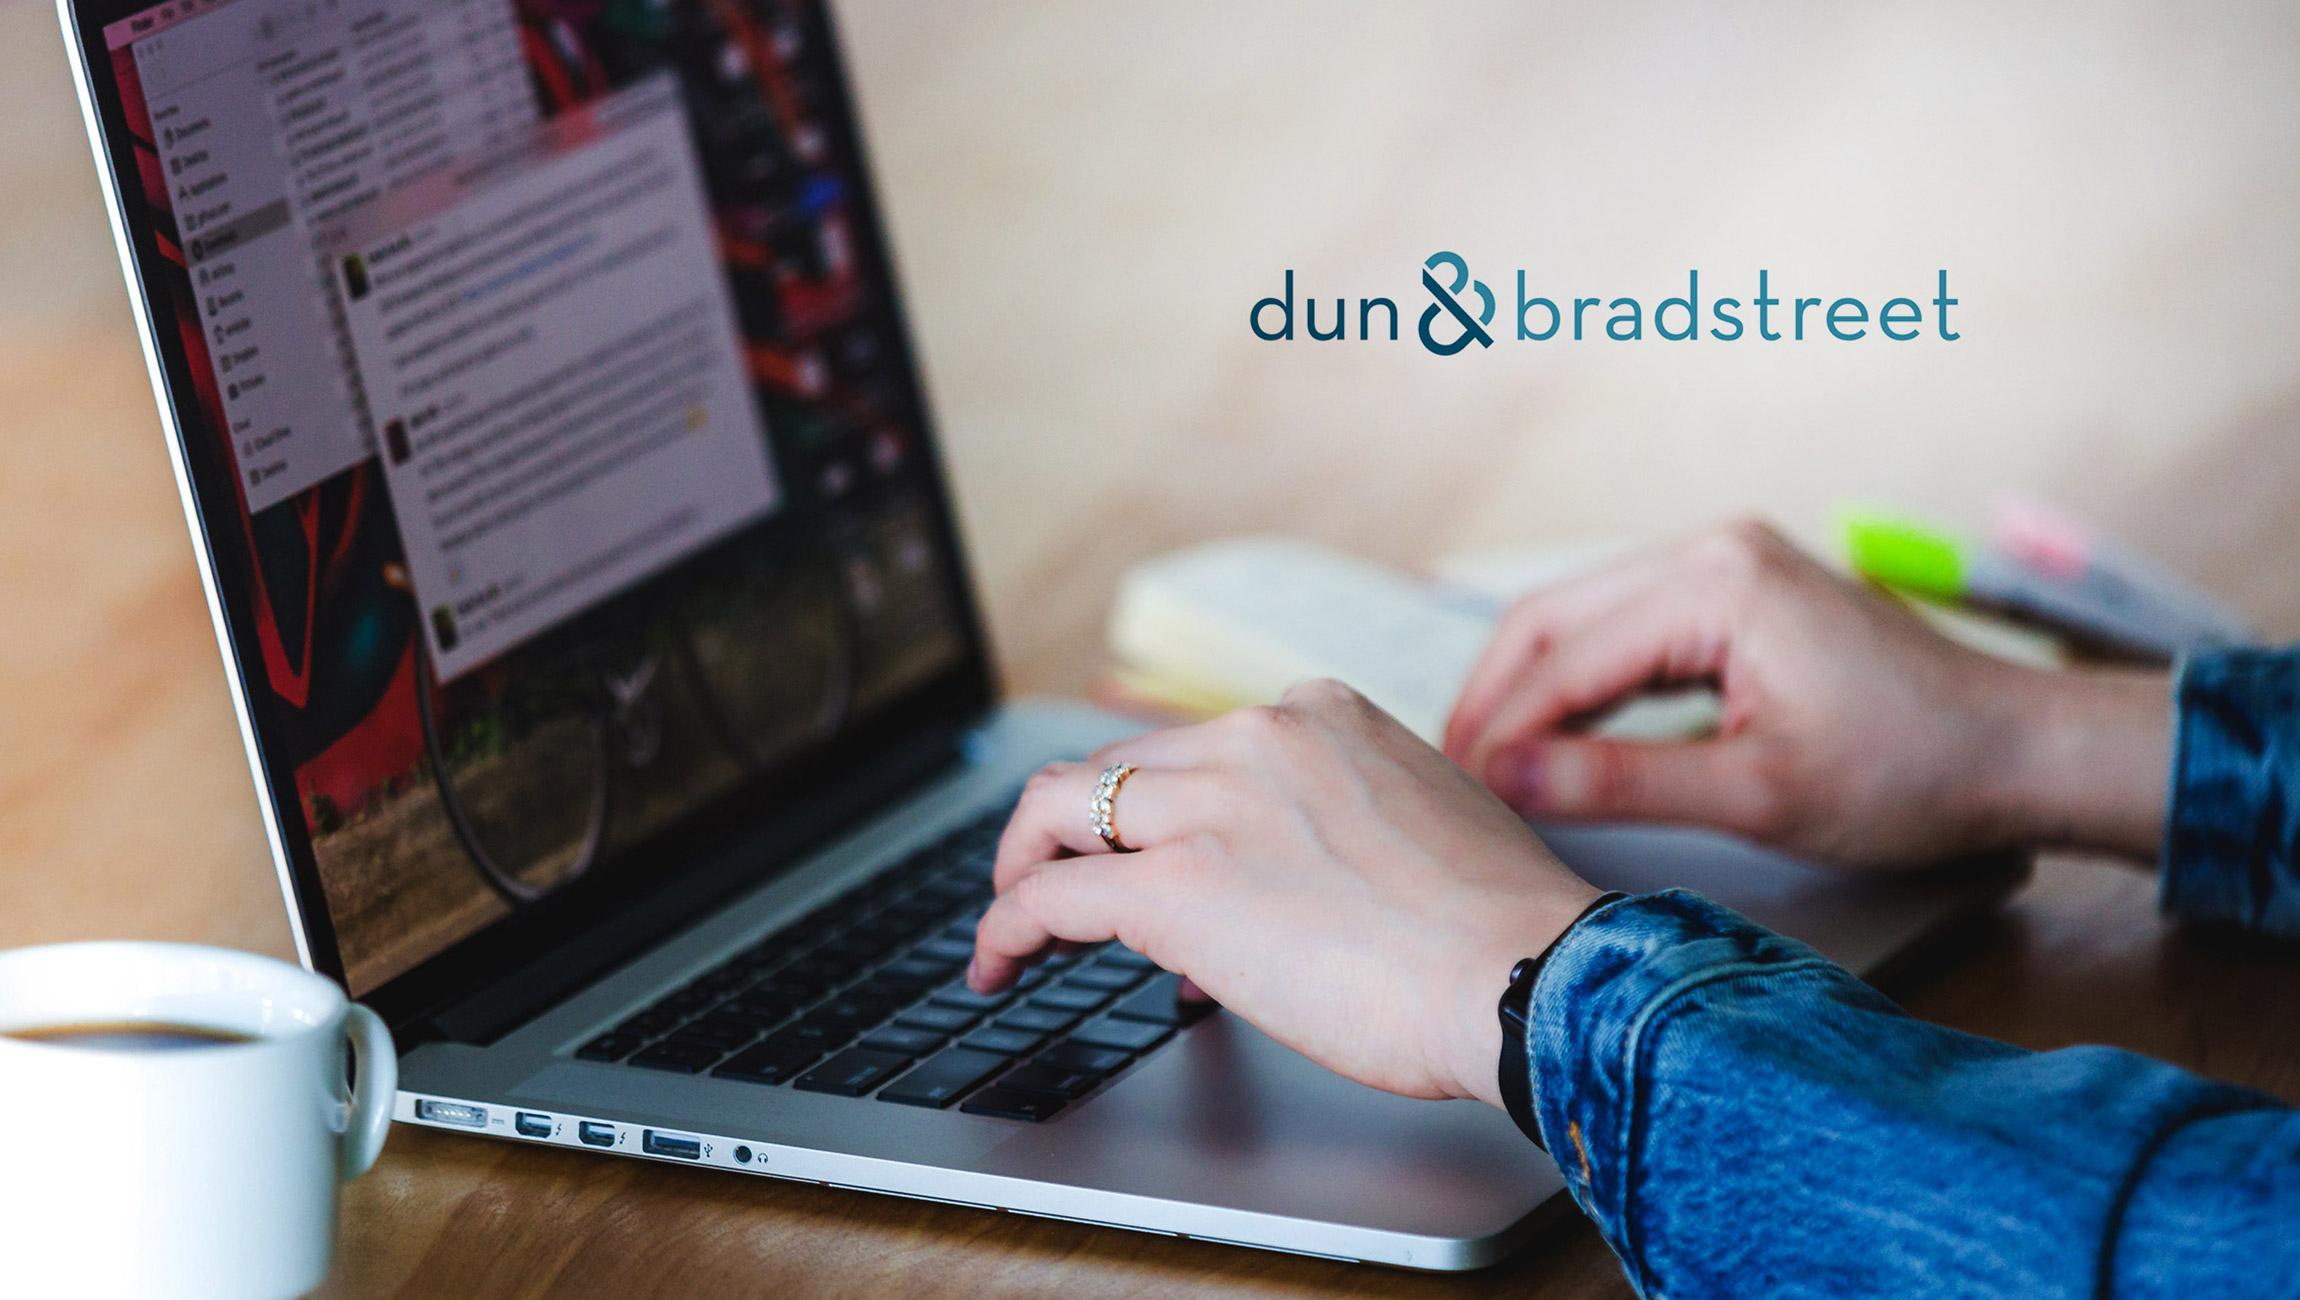 Dun & Bradstreet Launches D&B Connect, an AI-Powered Self-Service Platform for Simplified Data Management